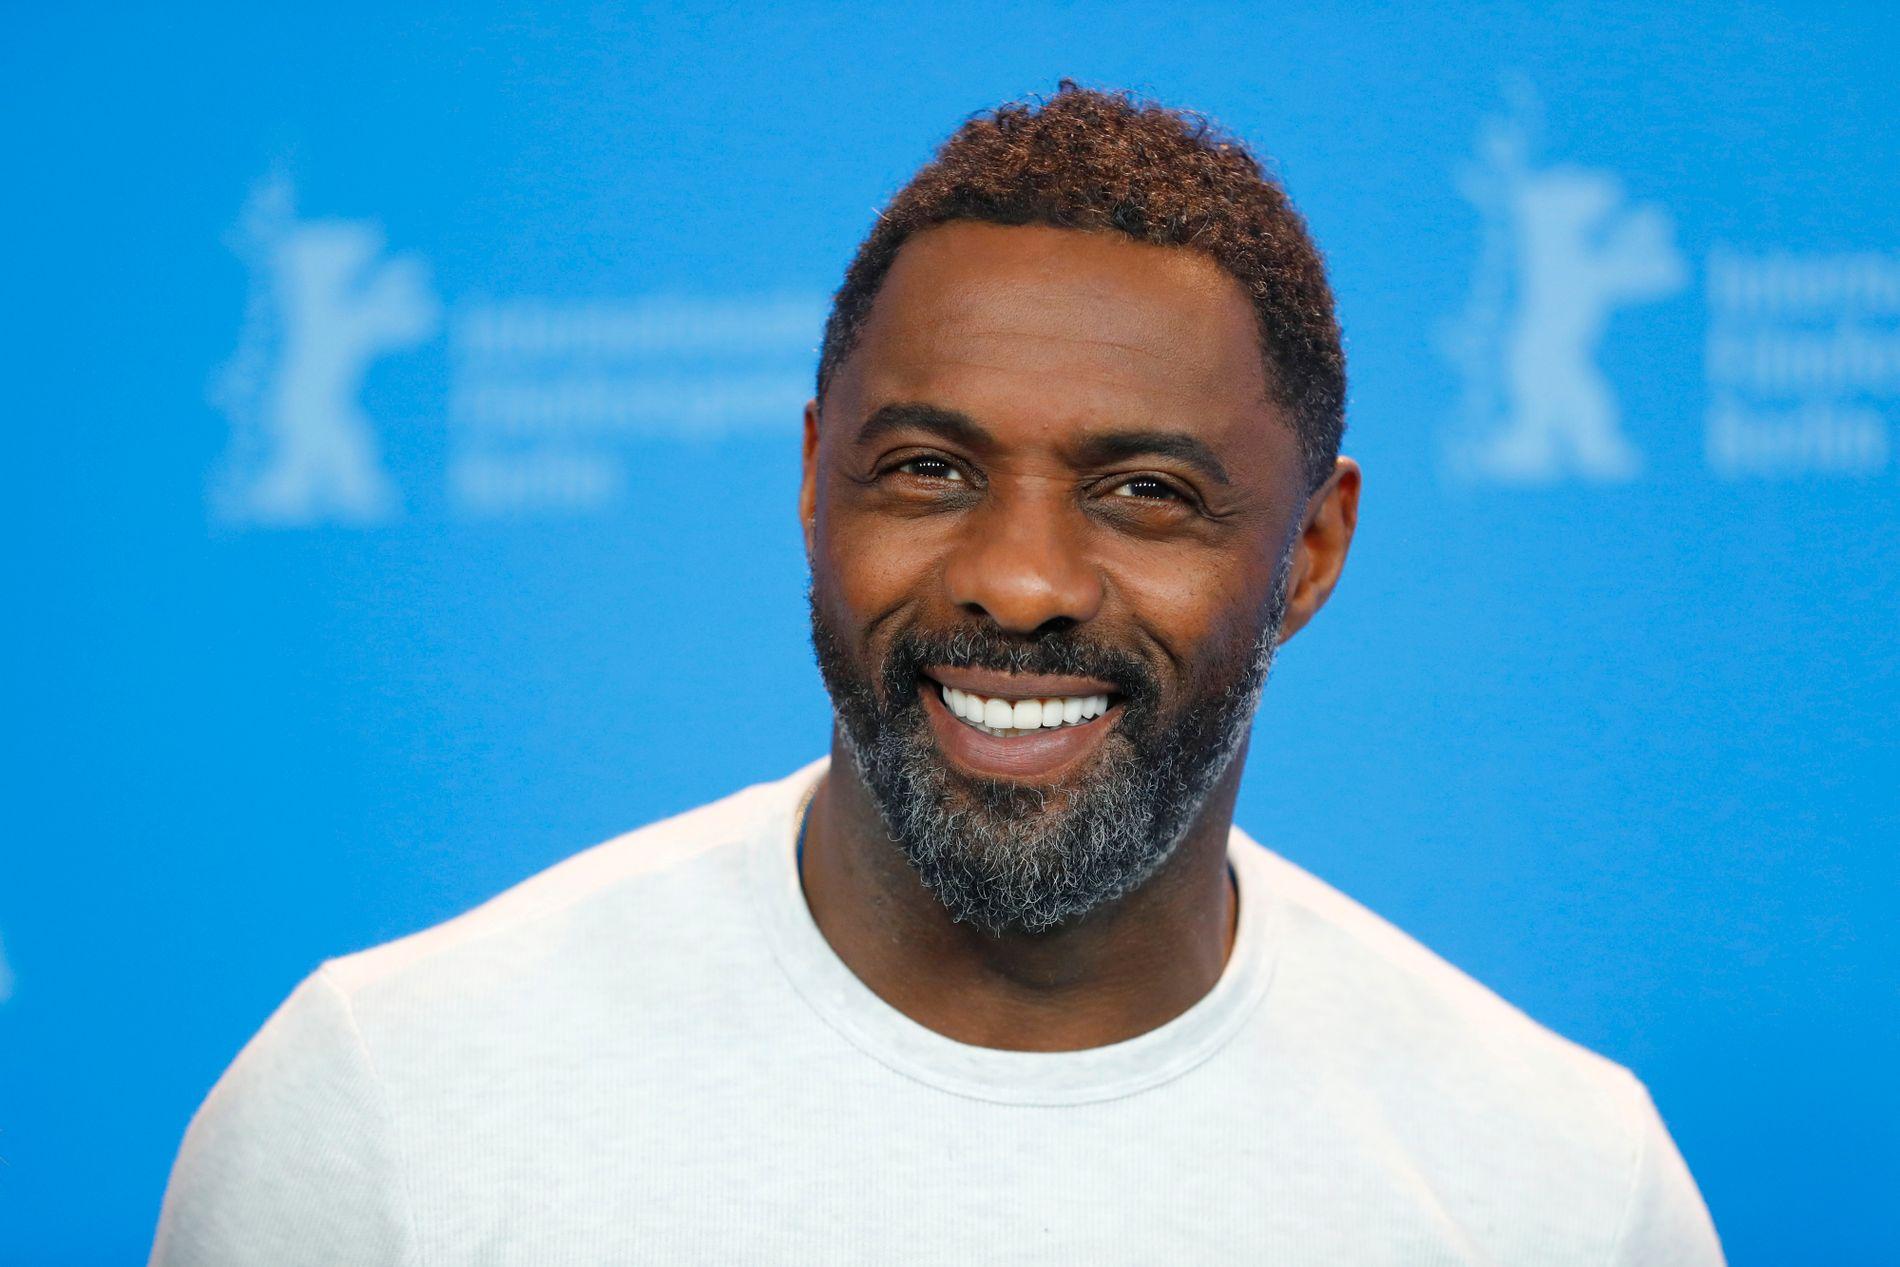 SEXY: - En hyggelig overraskelse, sier Idris Elba om kåringen.